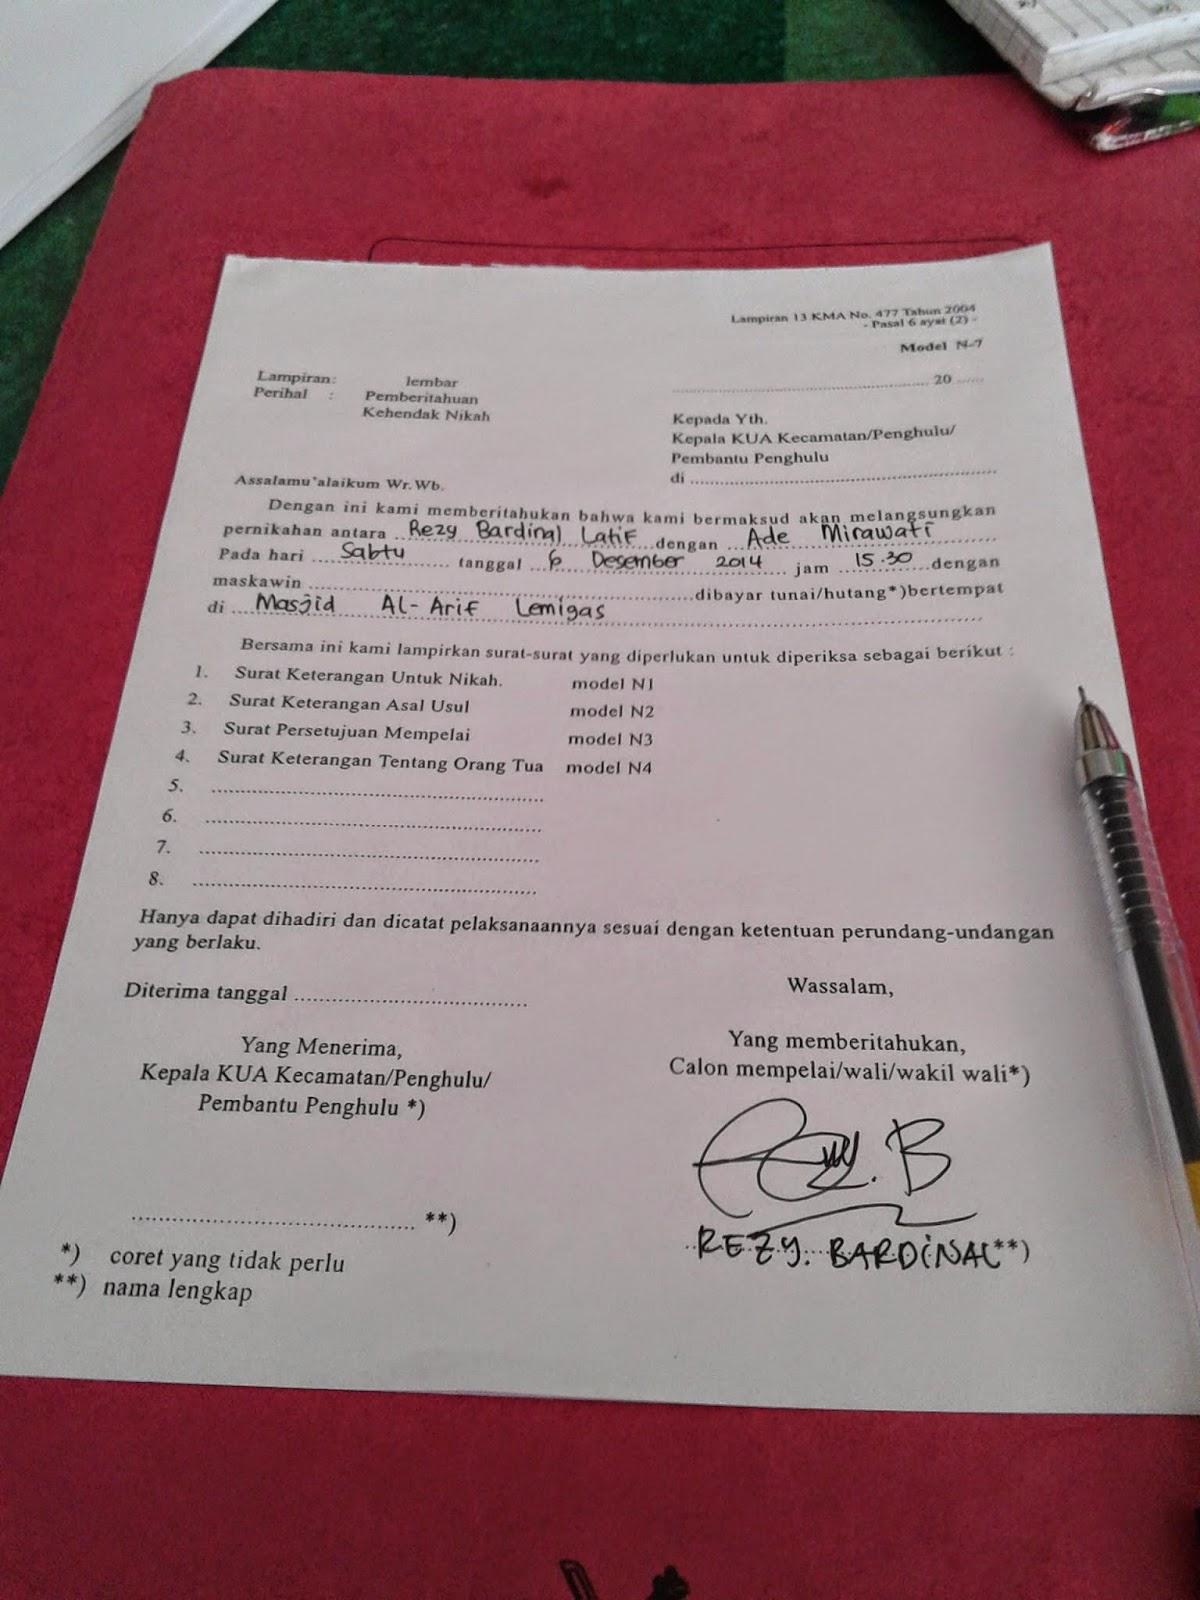 Rezy Bardinal Latif Catatan Harian Musisi Galau Aku Kau Ke Kua